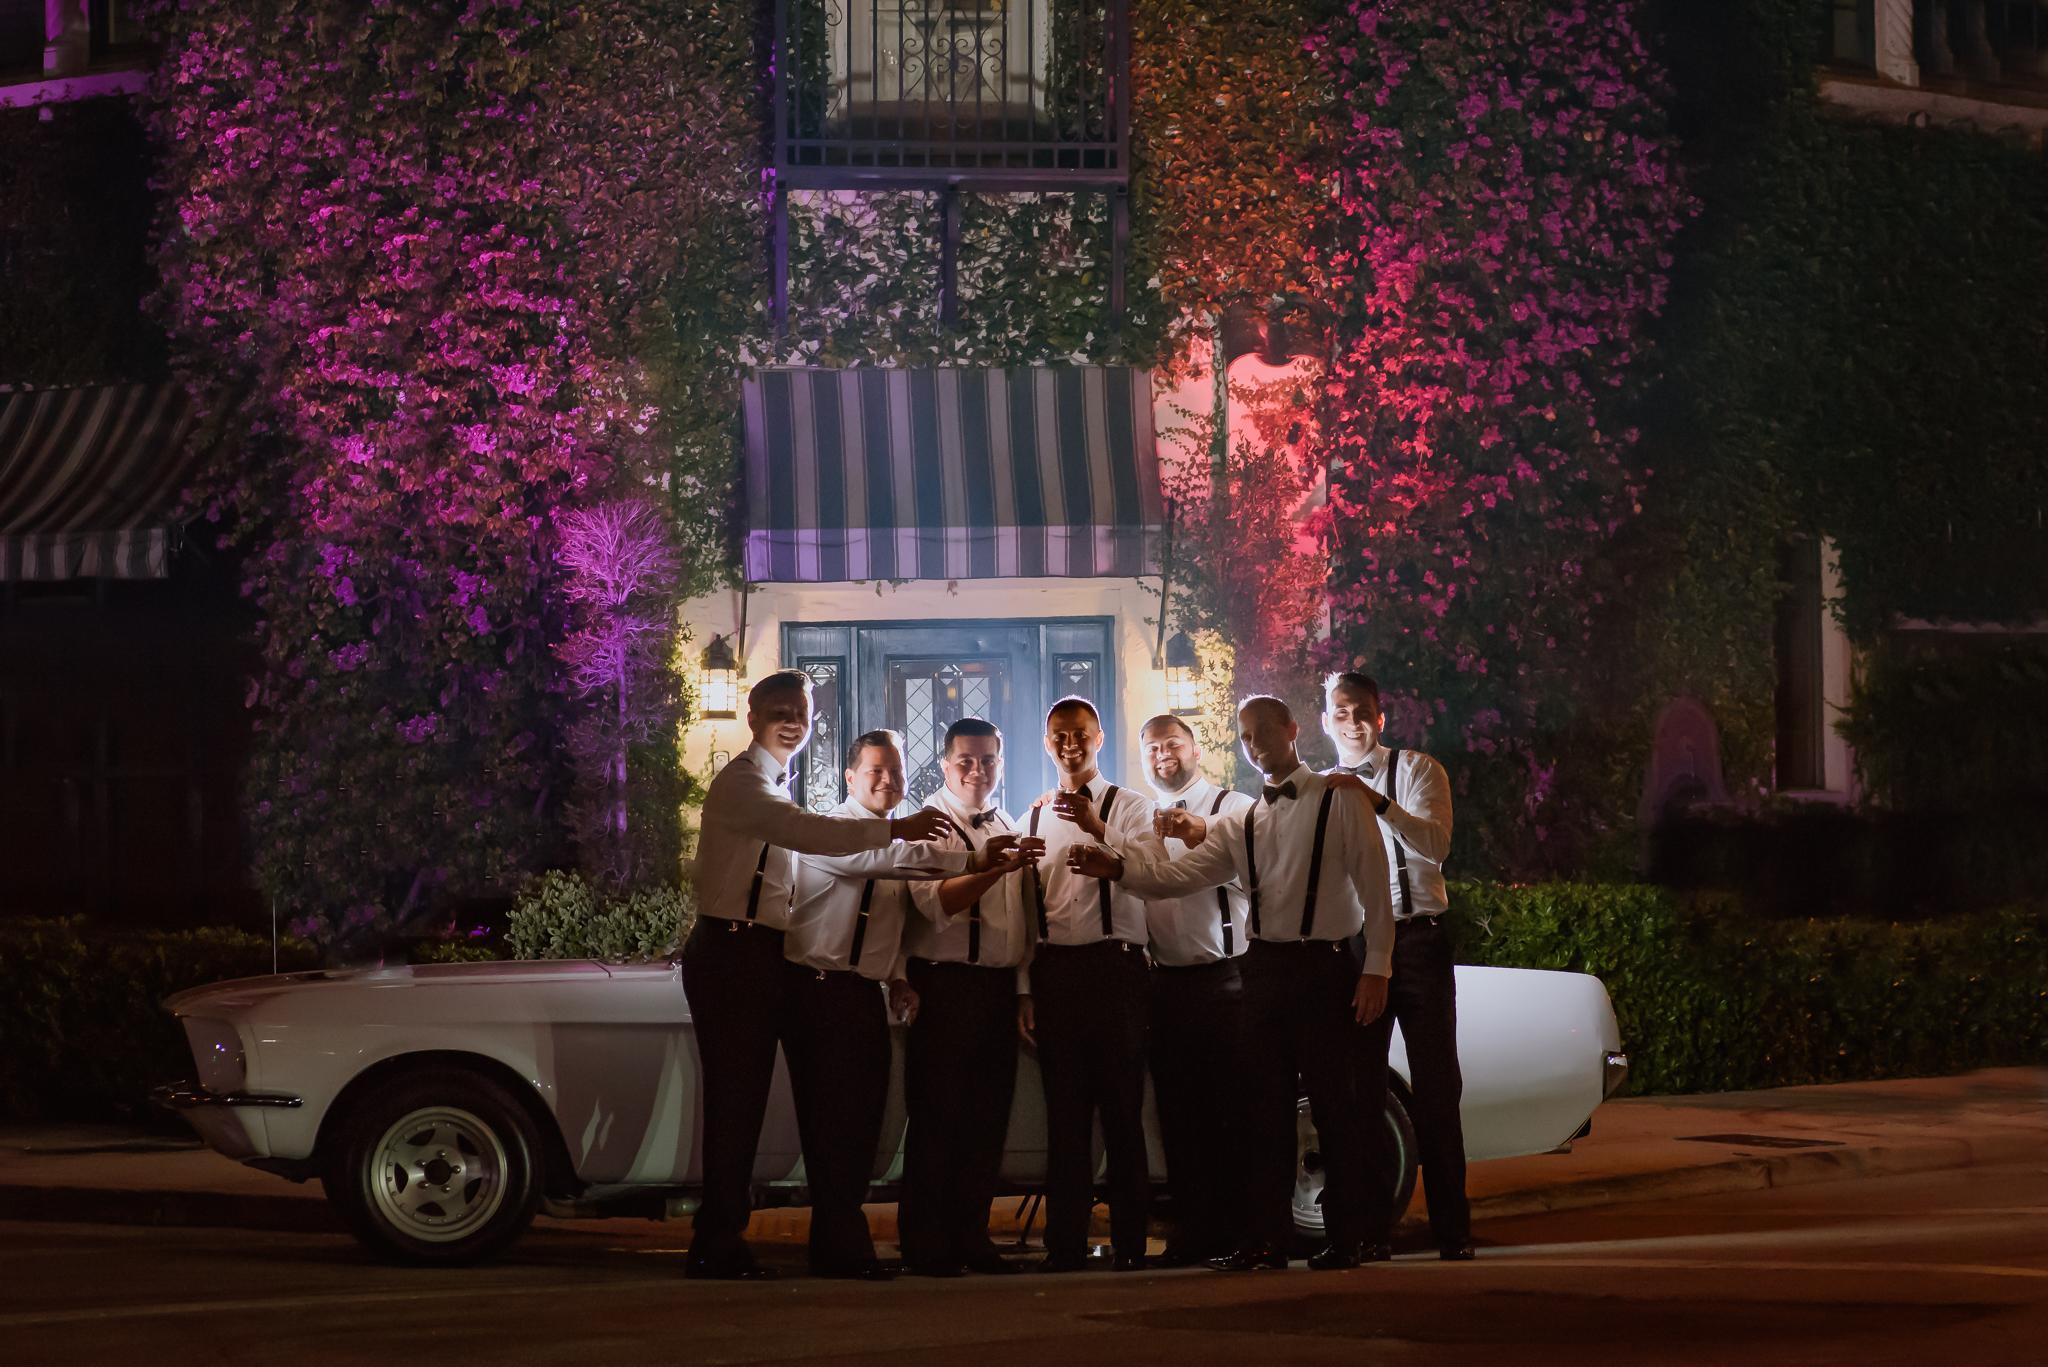 LIZETTE + GERRY WEDDING:  CORAL GABLES, FLORIDA LA JOLLA BALLROOM